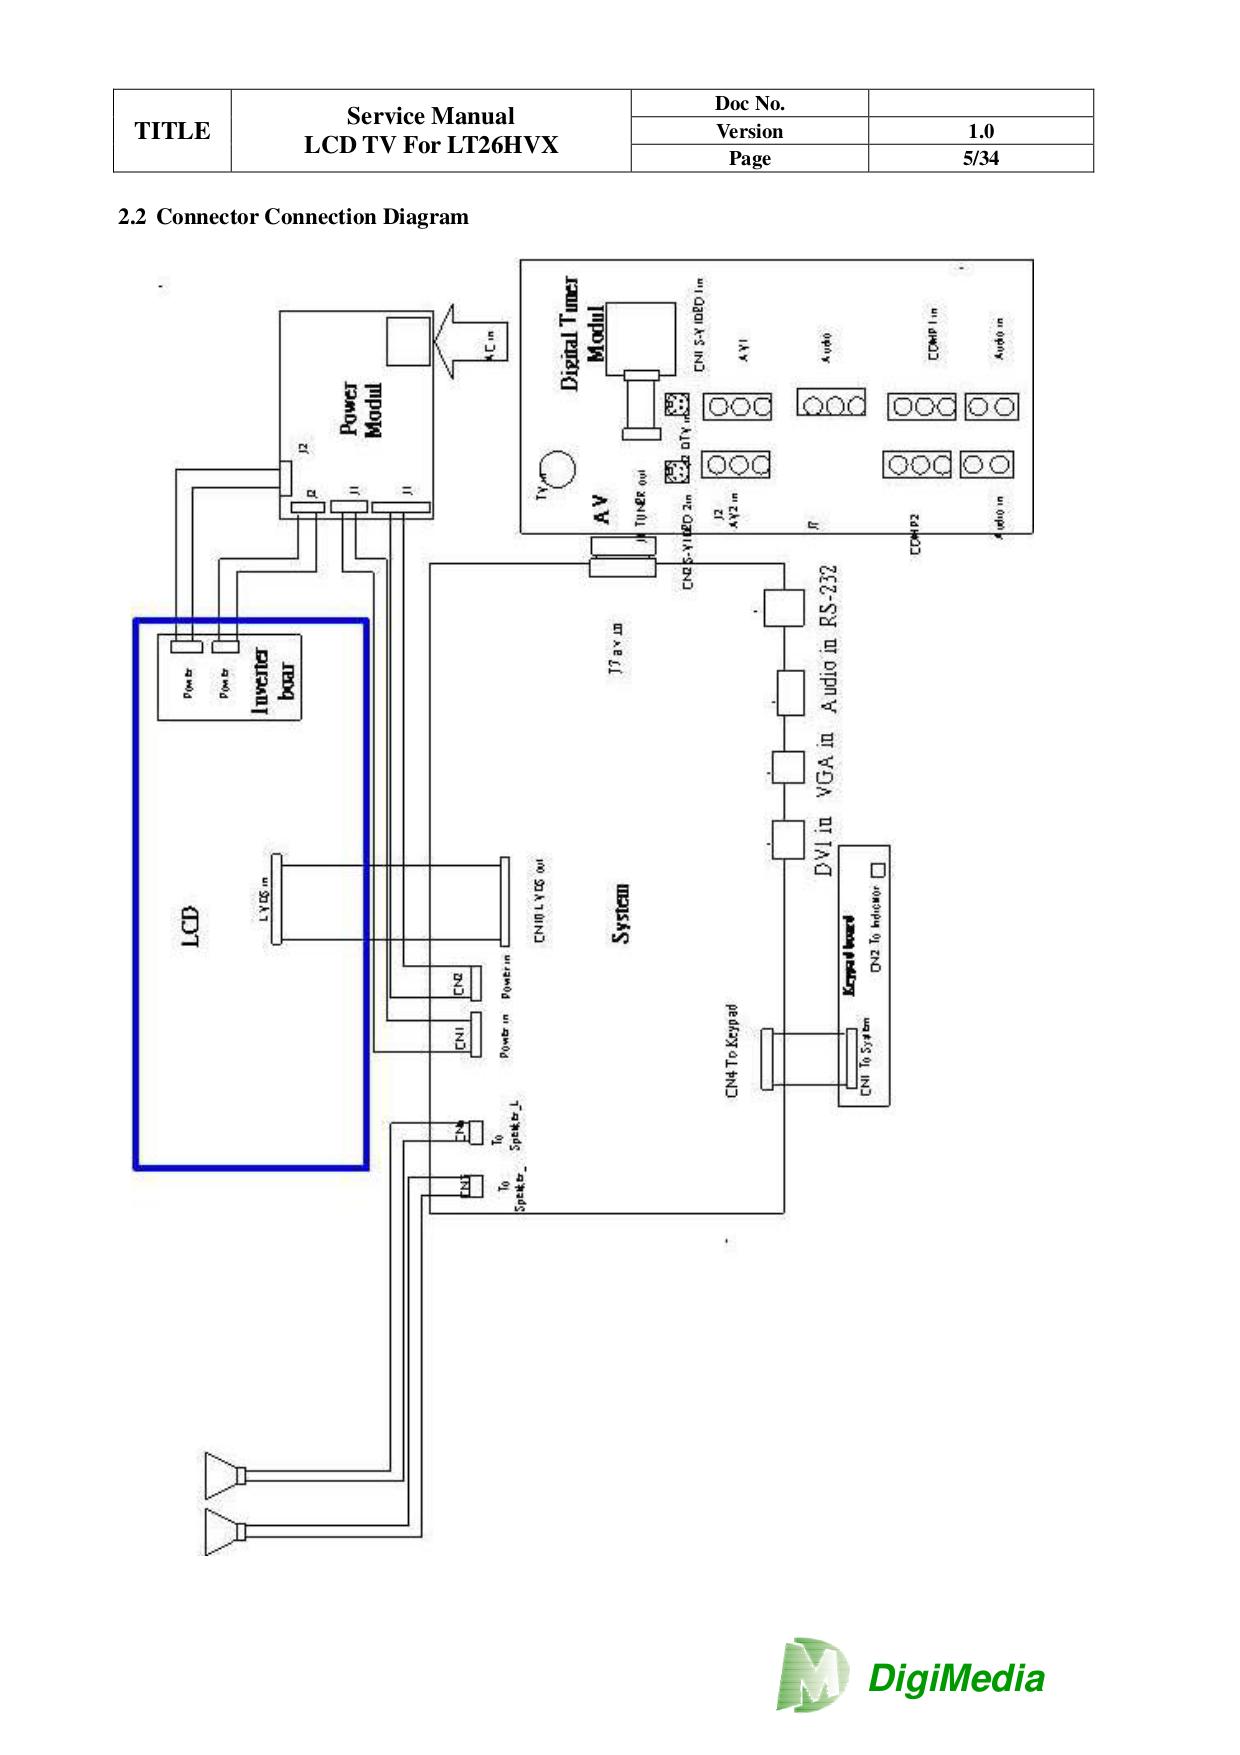 Thread Autopage 860 2000 Honda Civic Wiring Diagram Help